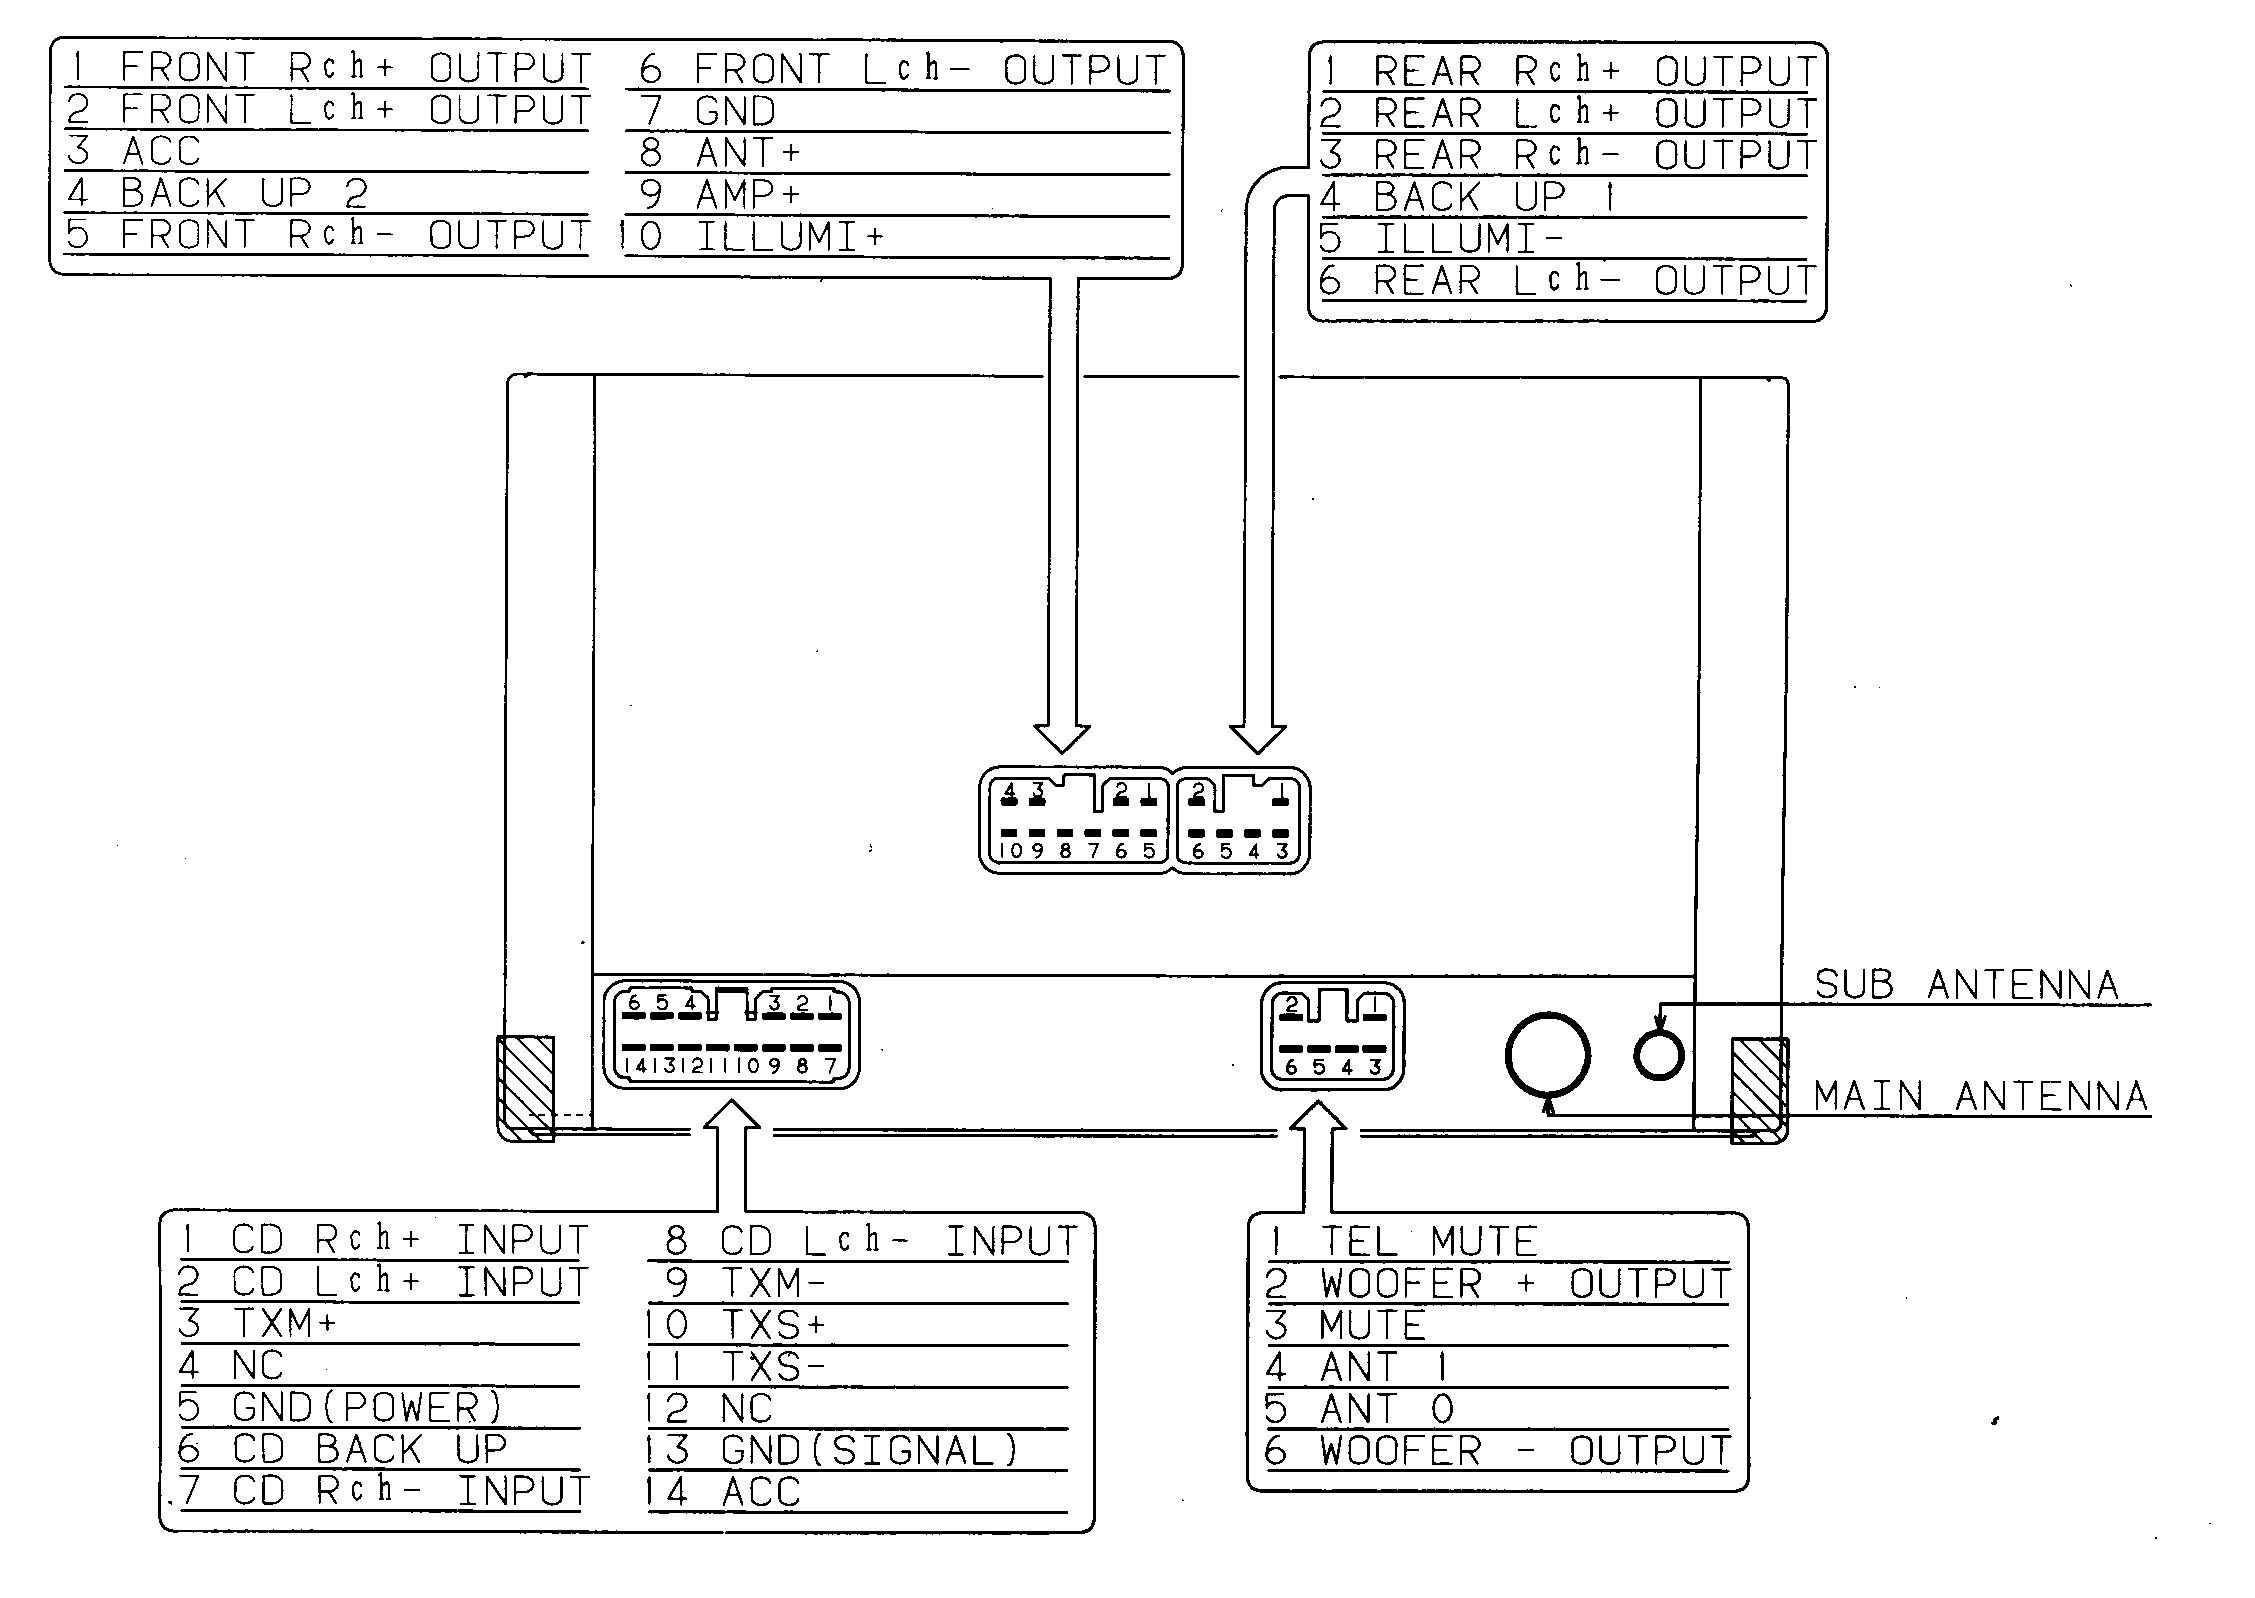 fujitsu ten 86120 pinout new wiring diagram image. Black Bedroom Furniture Sets. Home Design Ideas